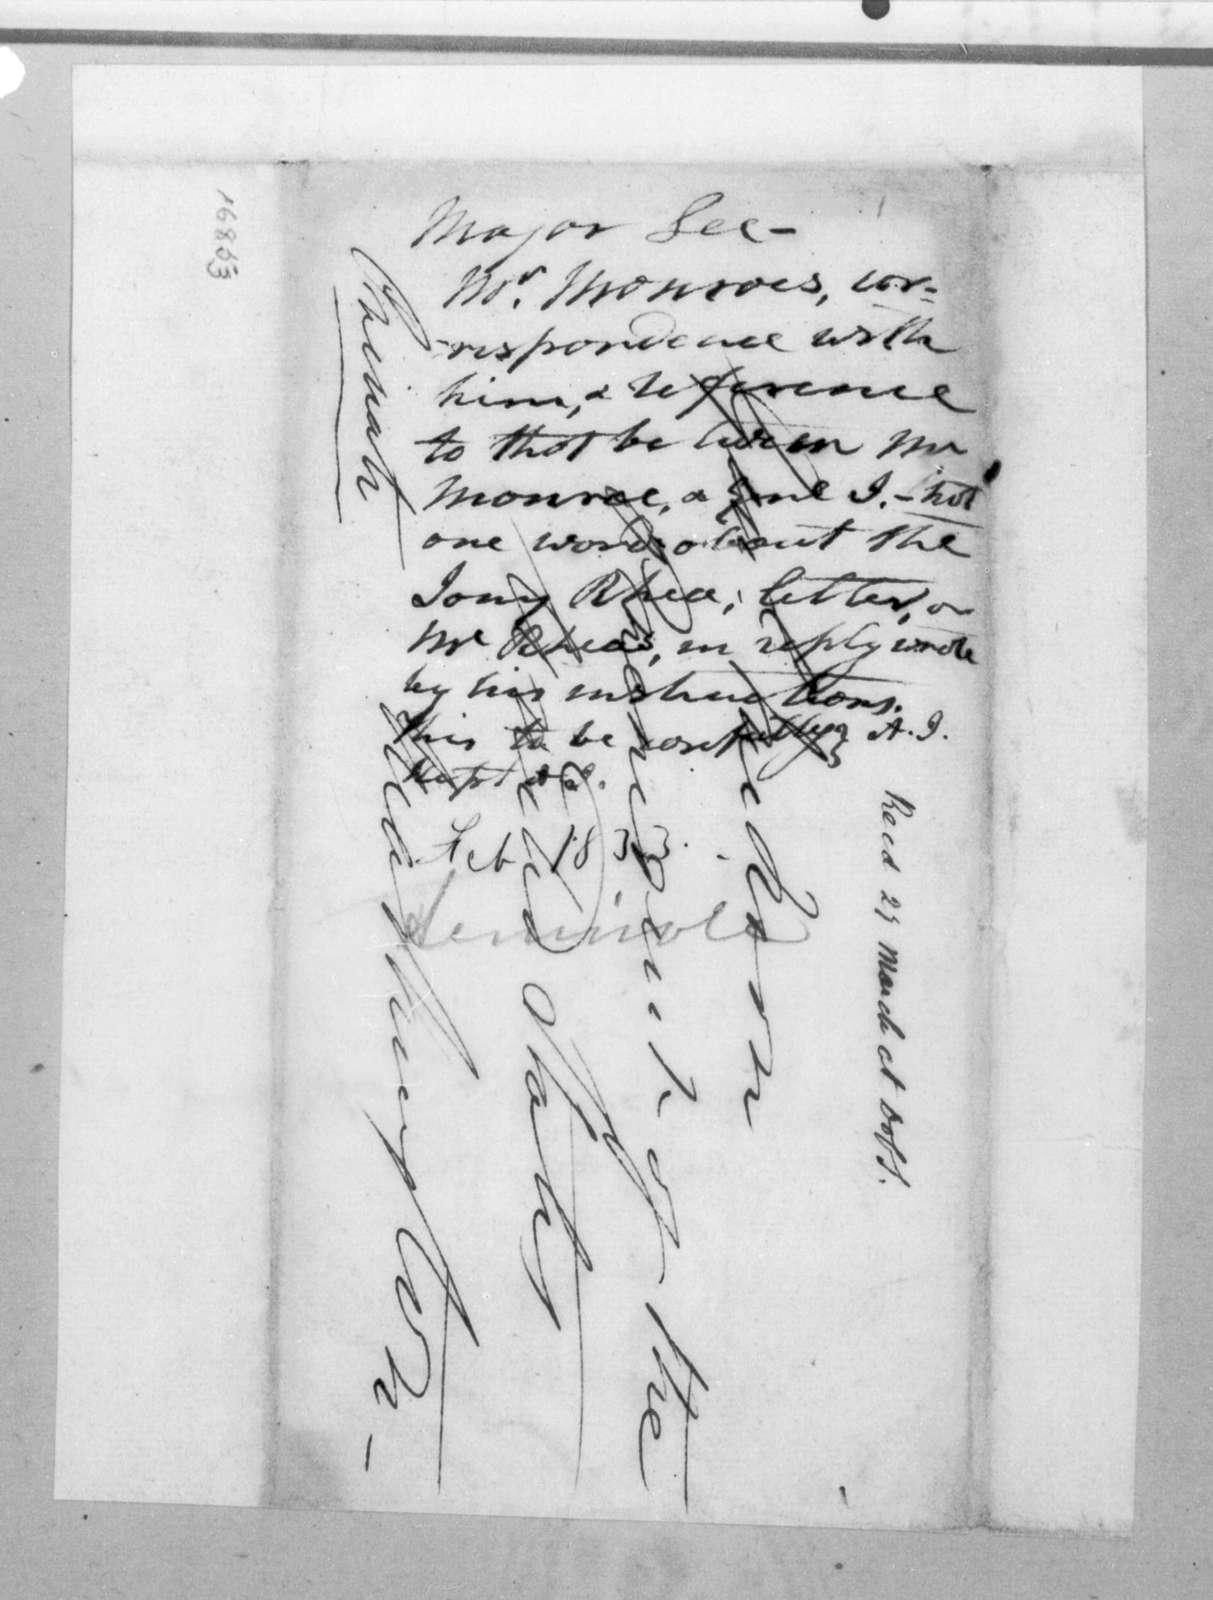 James Monroe to Henry Lee, February 10, 1833